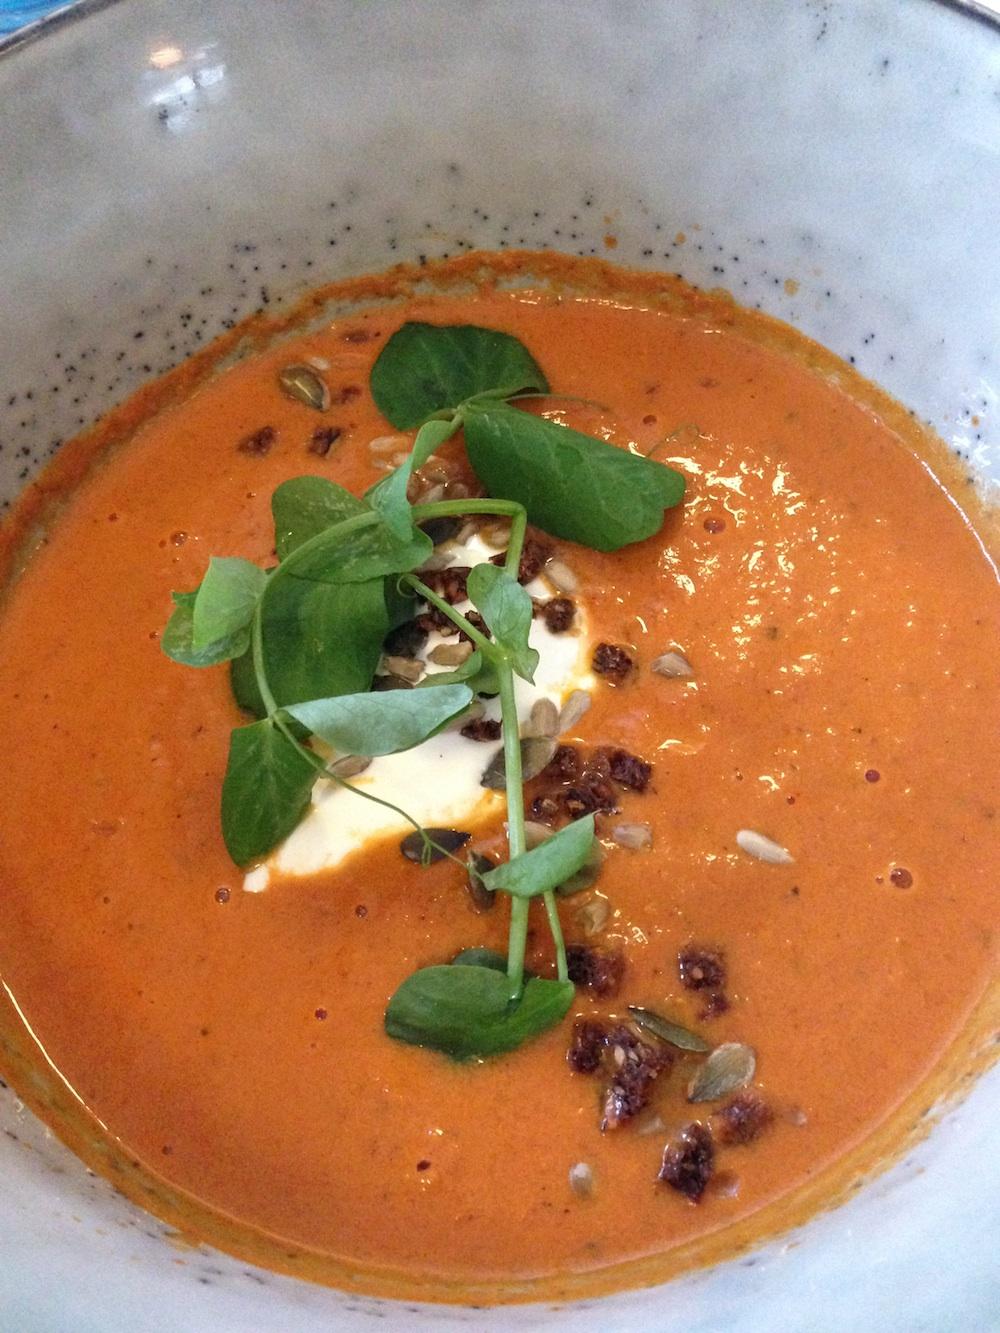 tomato soup cafe norden, healthy pleaces to eat in Copenhagen